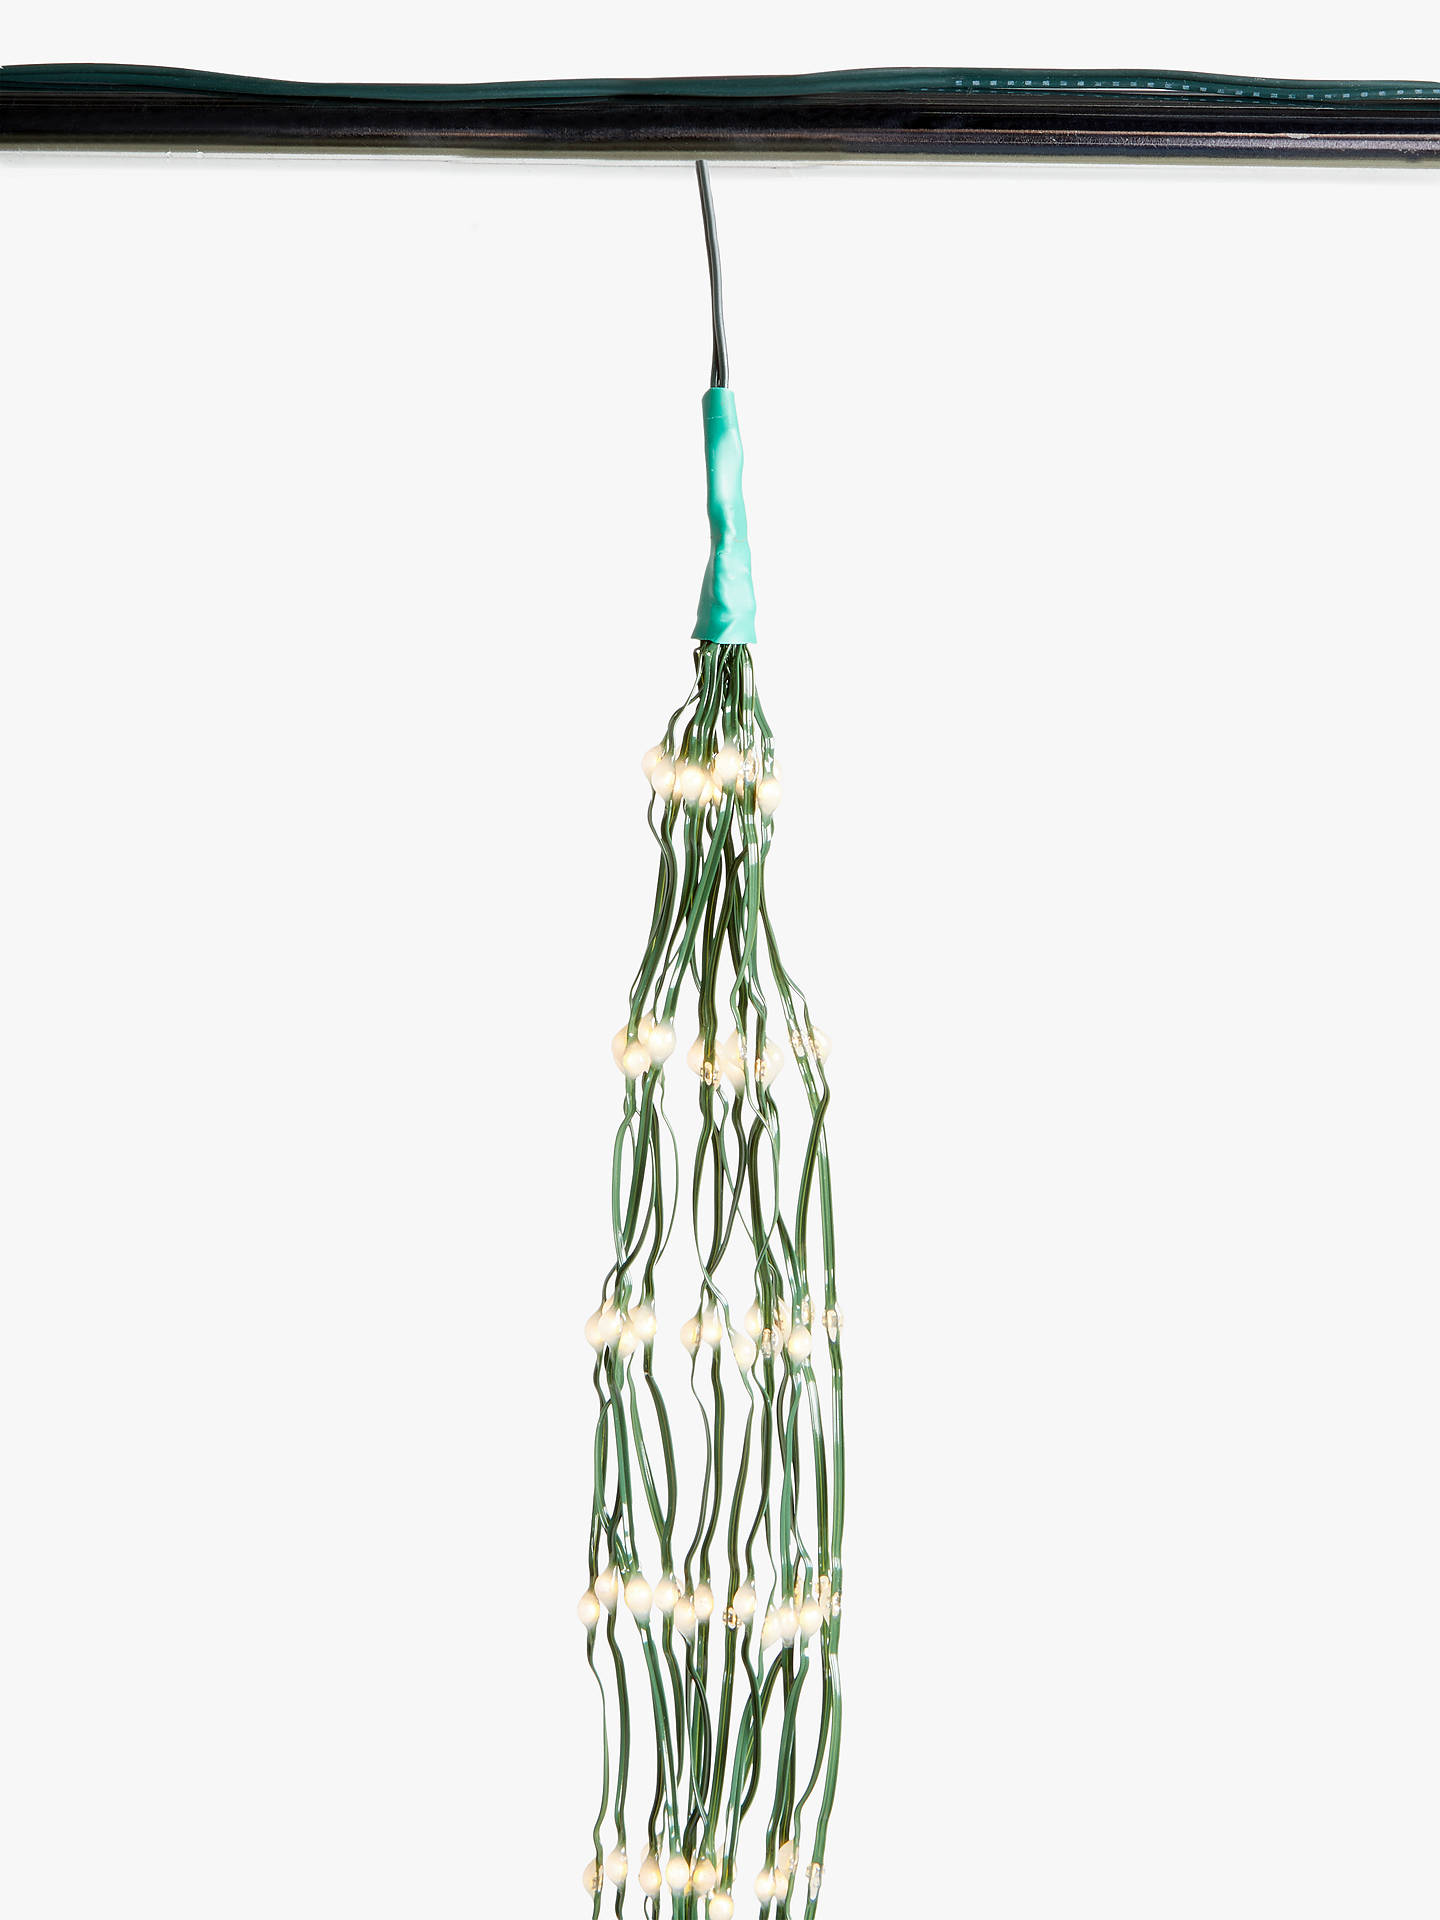 Pure White 1x John Lewis 432 LED Waterfall Christmas Lights 6ft Tree